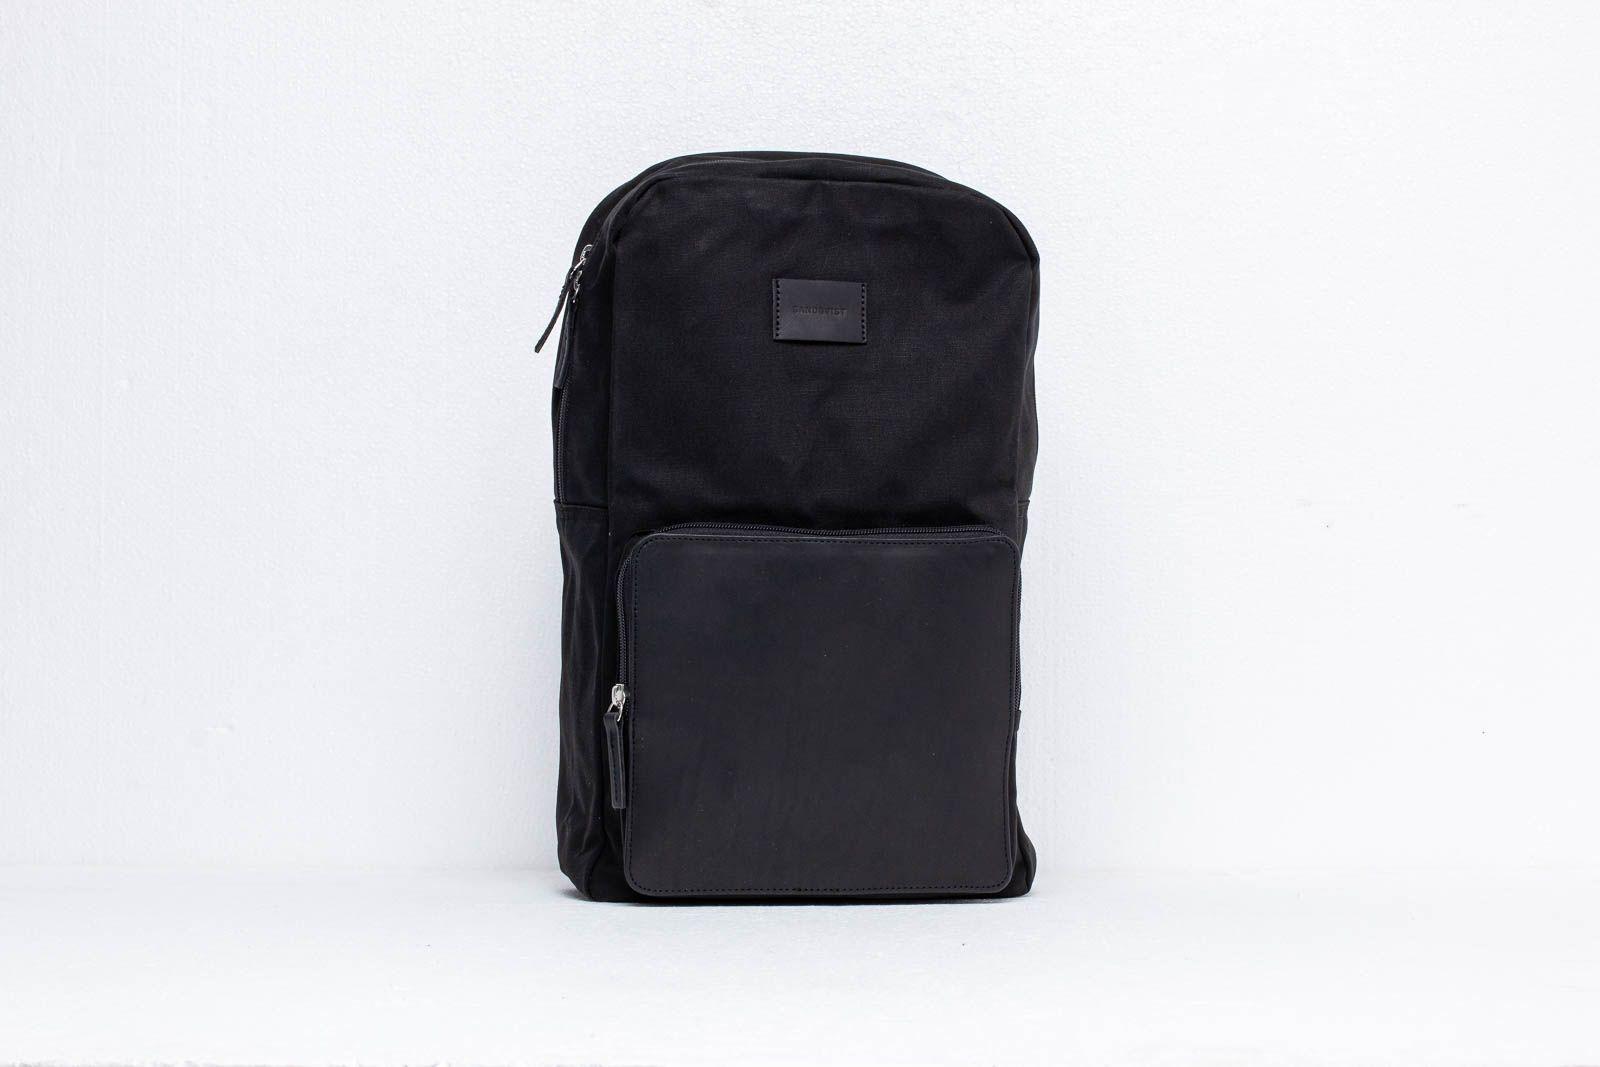 SANDQVIST Kim Grand Backpack Black za skvelú cenu 94 € kúpite na Footshop.sk